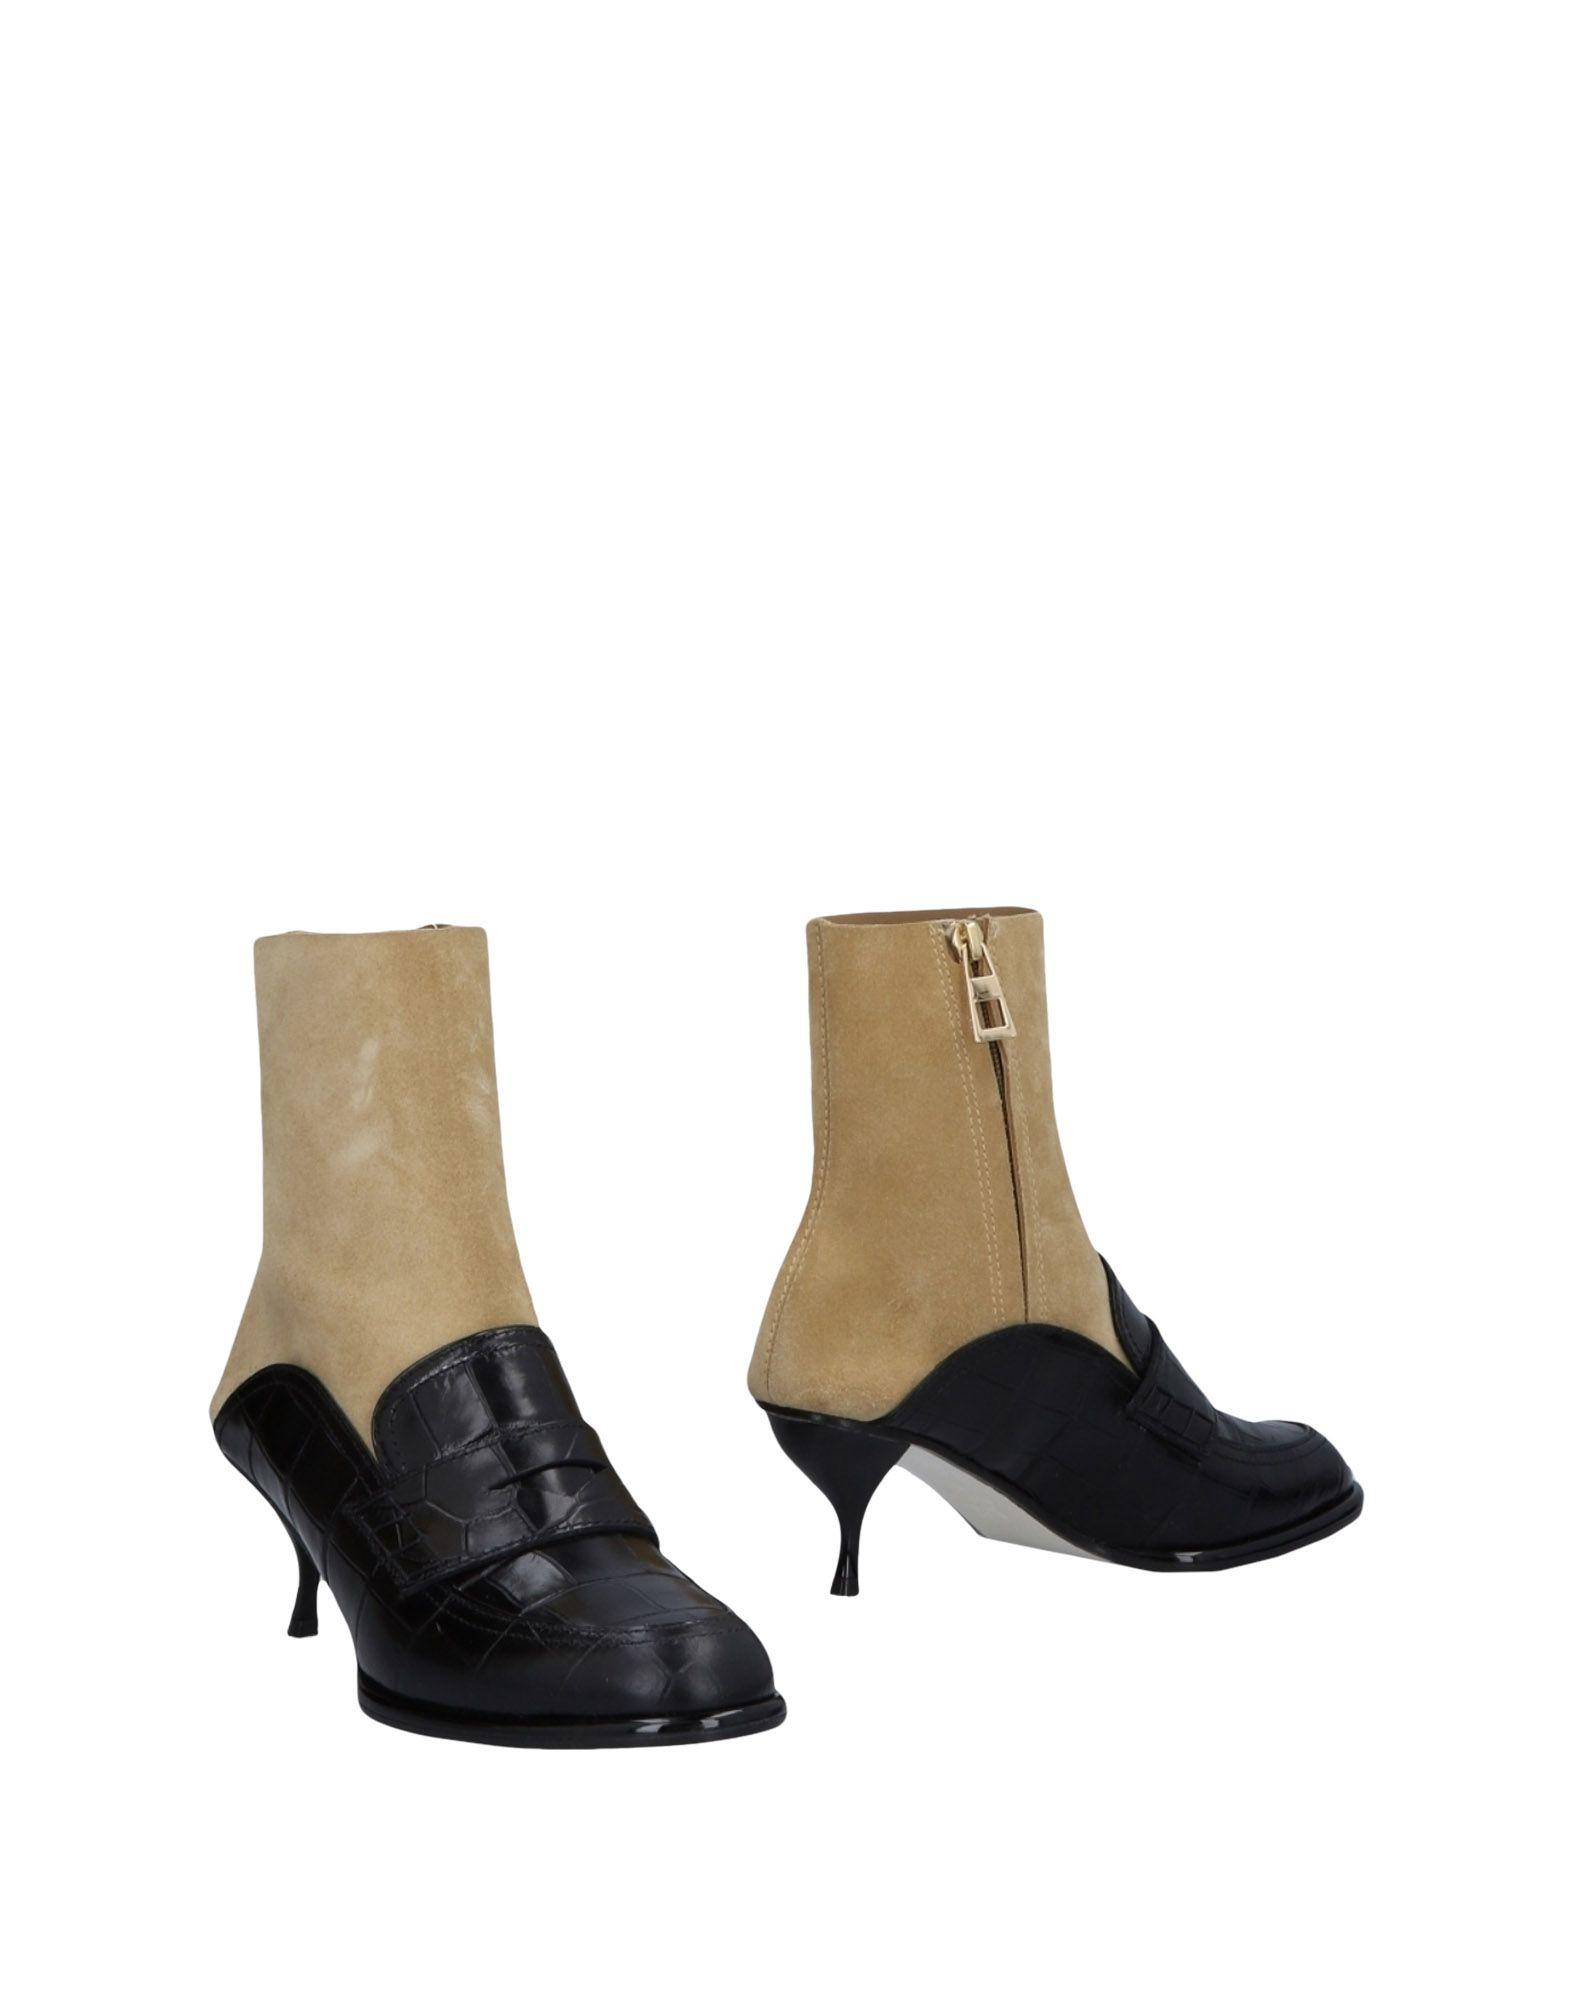 Haltbare Mode billige Schuhe Loewe Stiefelette Damen  11475633PN Heiße Schuhe